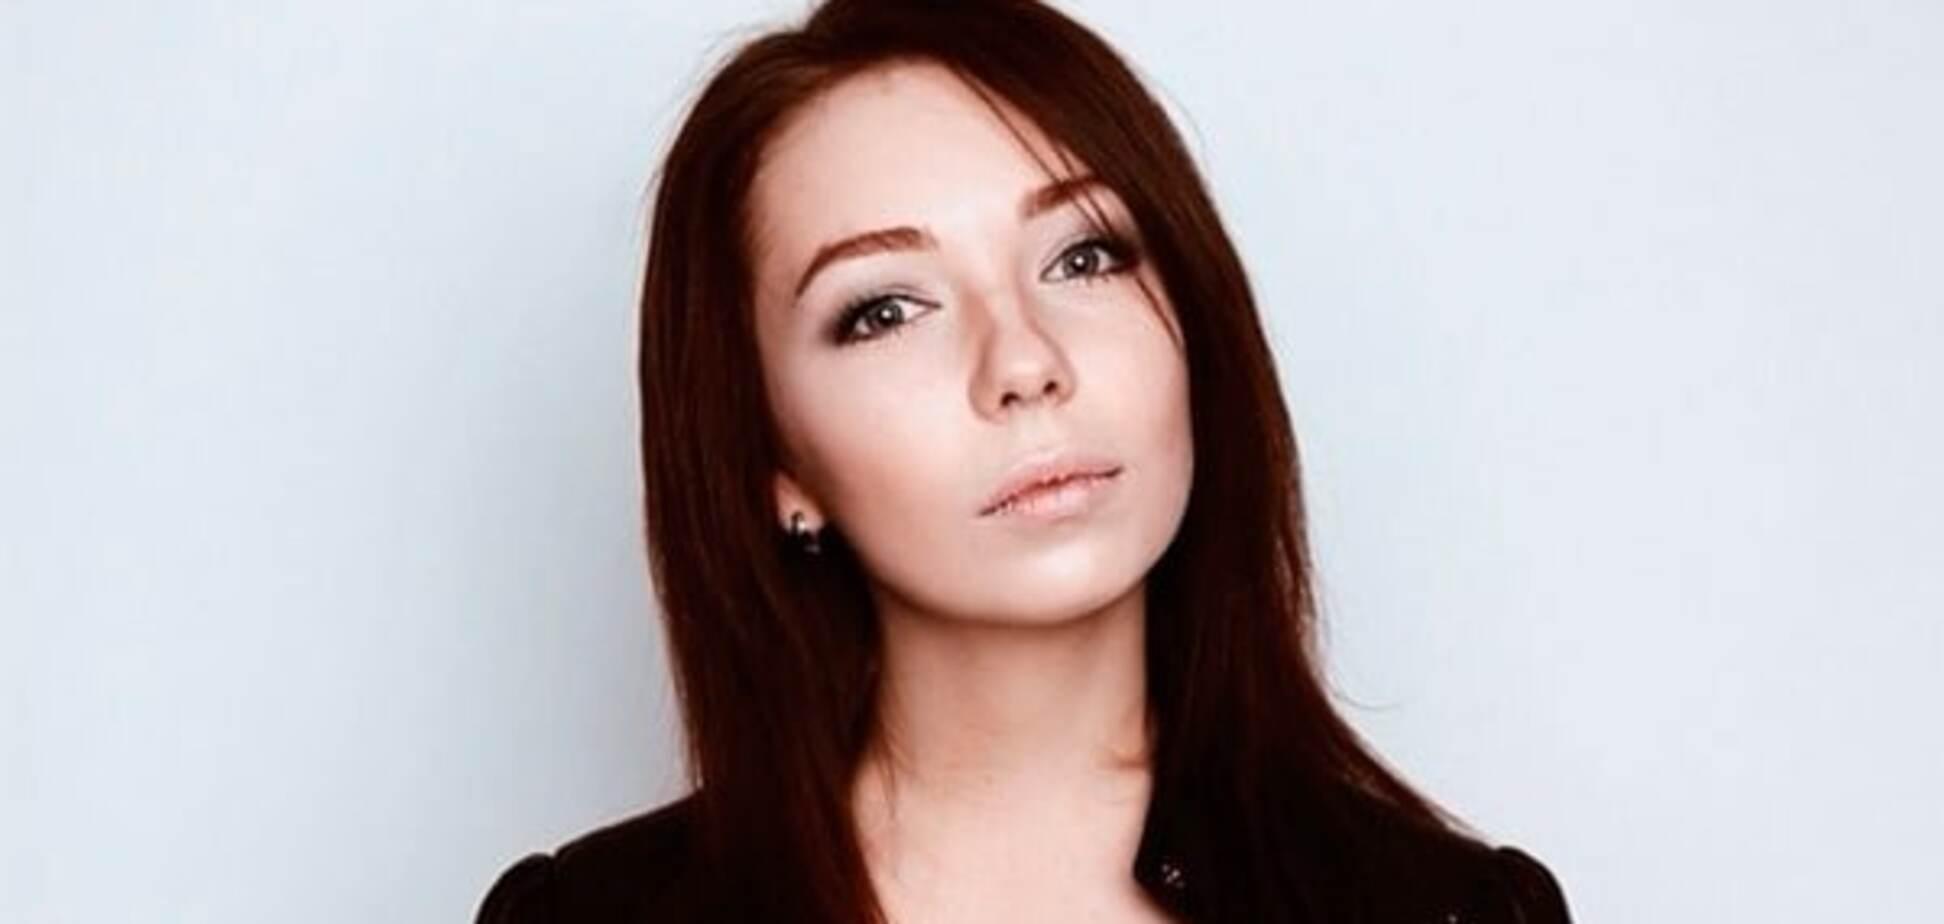 23-летняя дочь Шнурова вышла замуж за питерского бармена